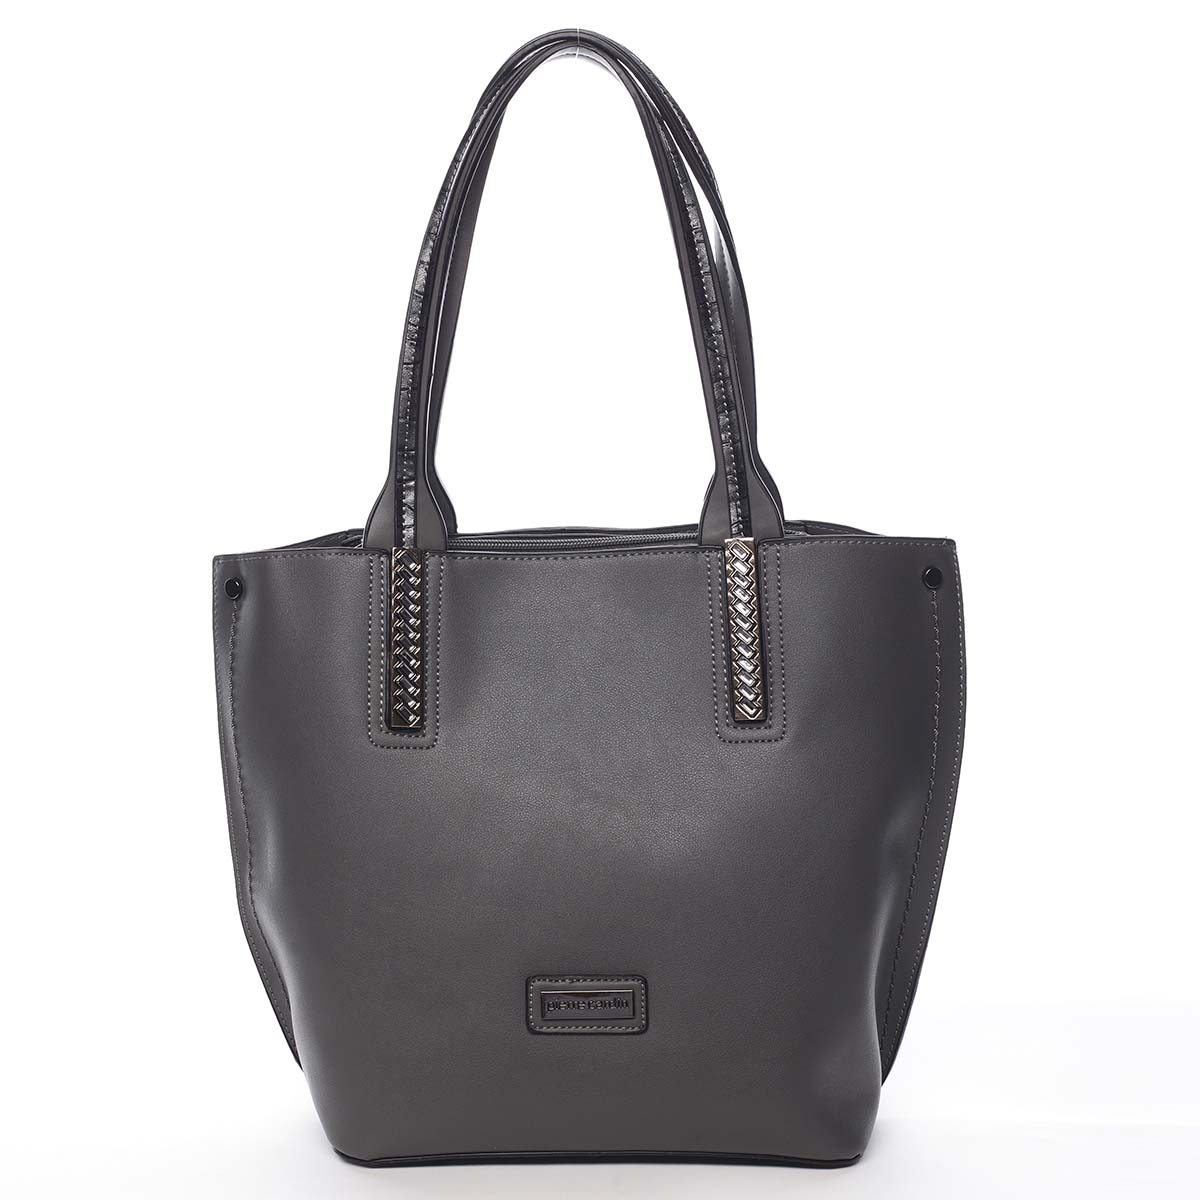 Dámska kabelka cez rameno šedá - Pierre Cardin Yanna čierna